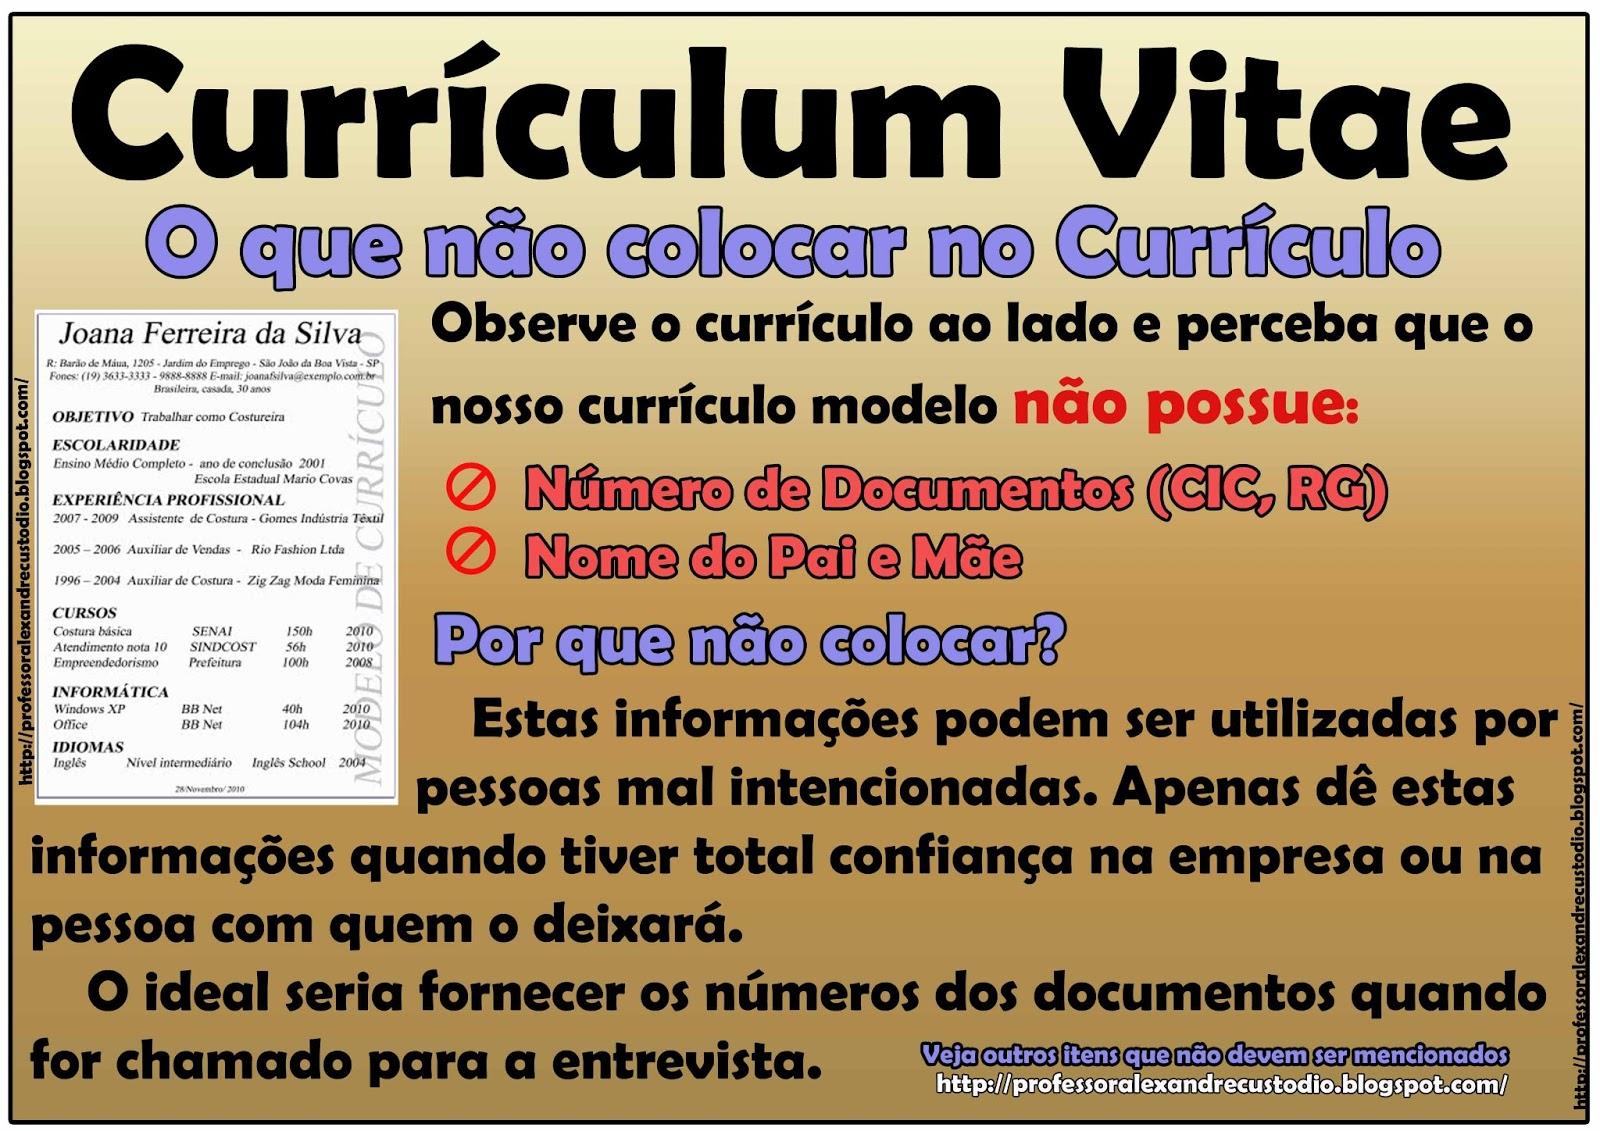 Lujoso Curriculum Vitae Para Custodio Composición - Ejemplo De ...